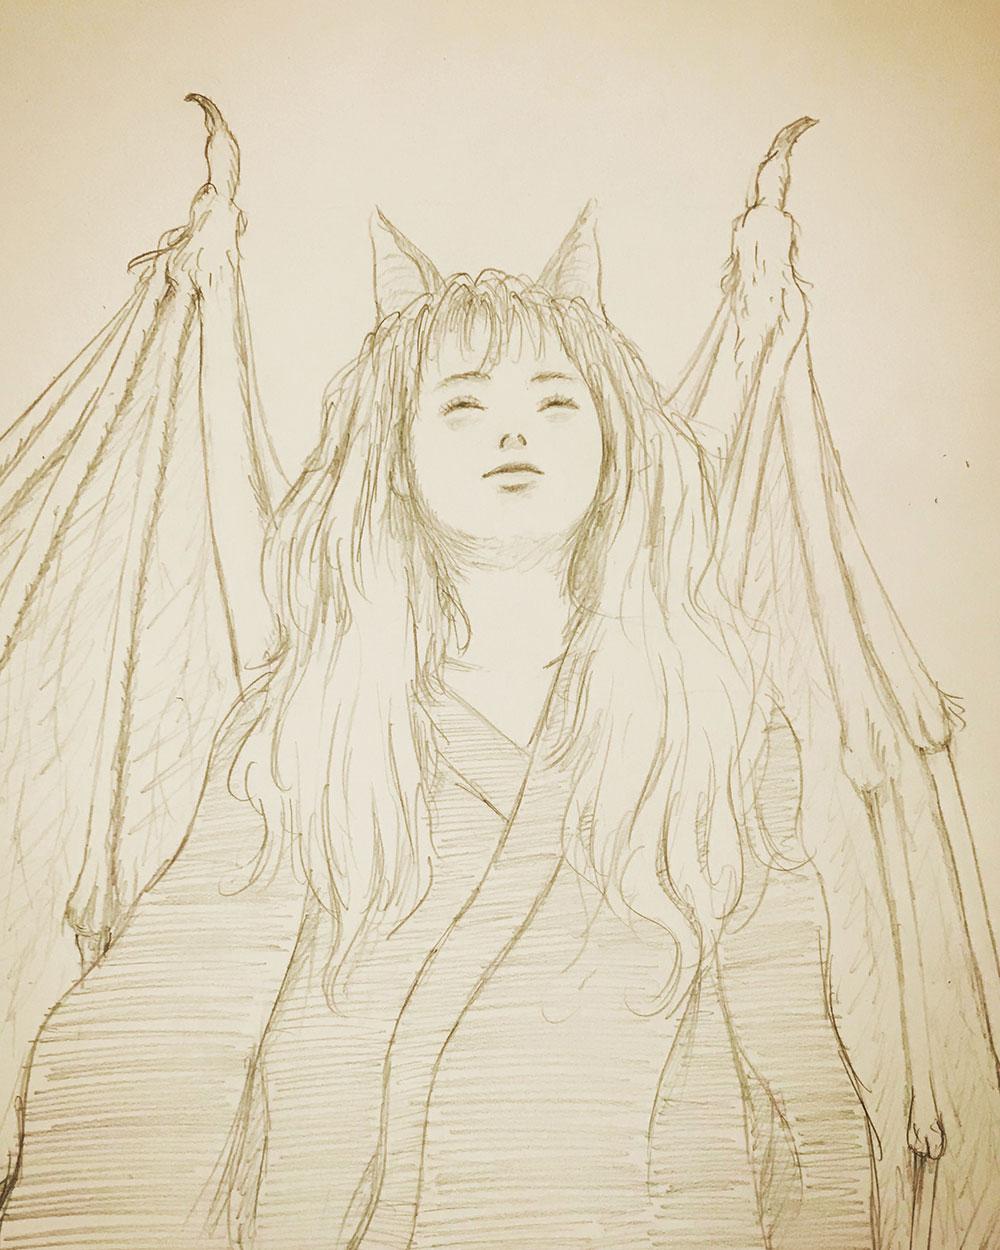 鉛筆画で蝙蝠女 KOMORI